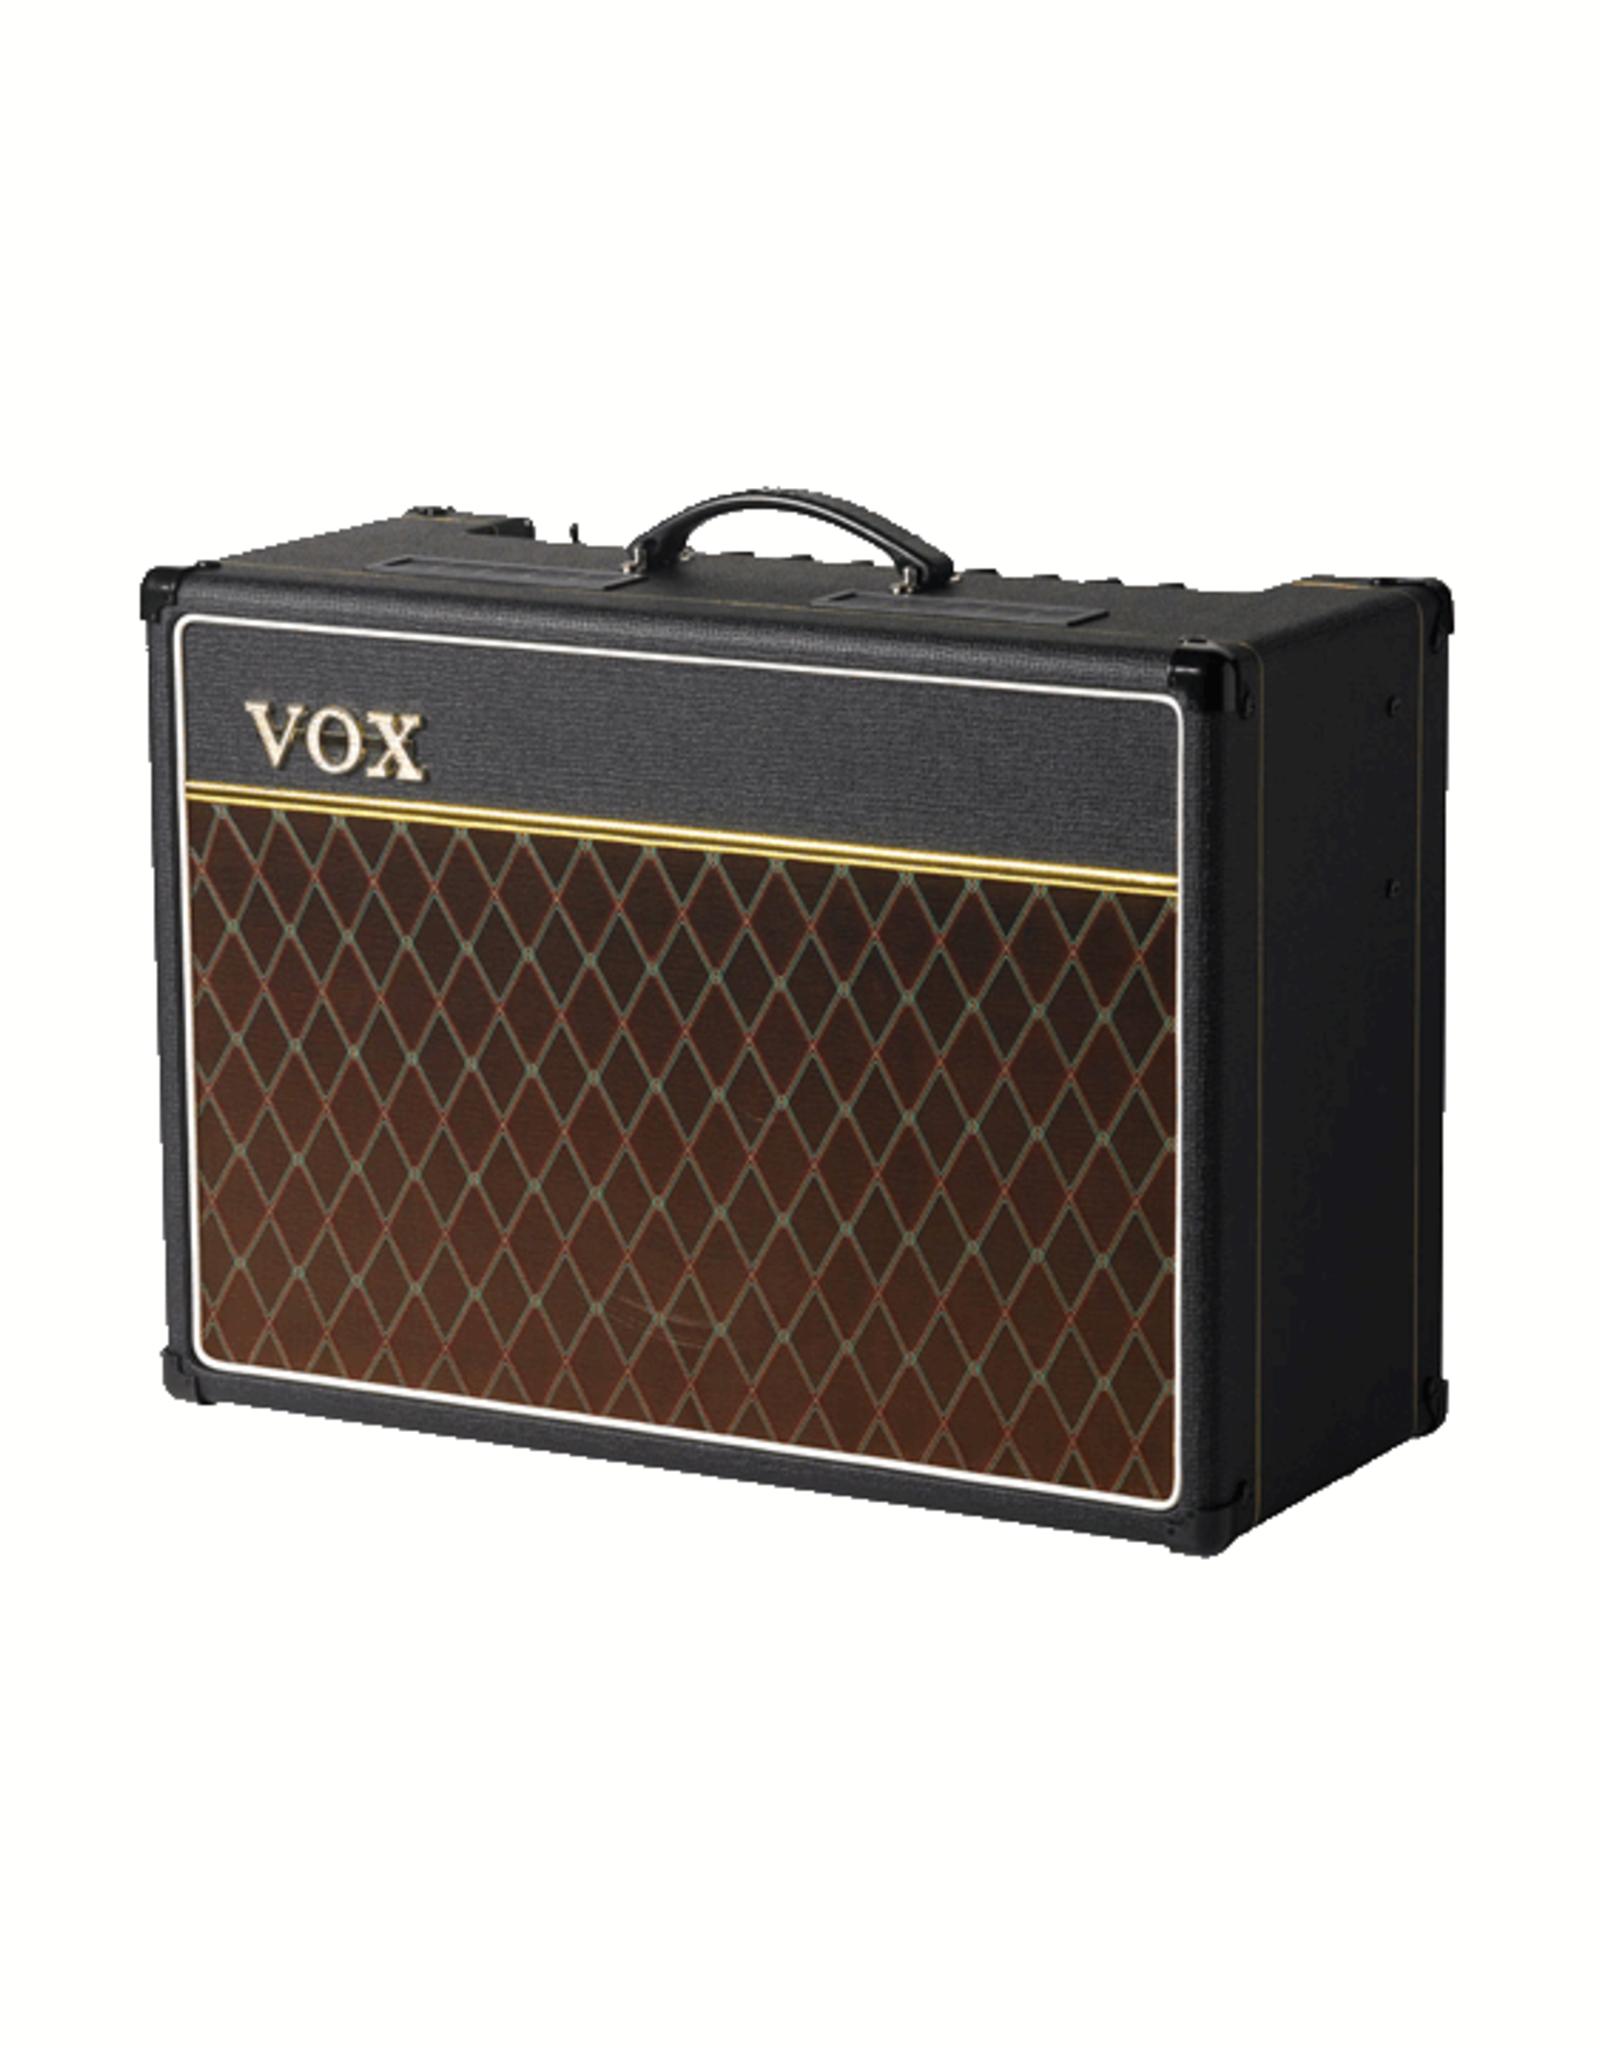 "Vox Vox AC15C1 15 watt 1x12"" combo with Celestion Greenback speaker"